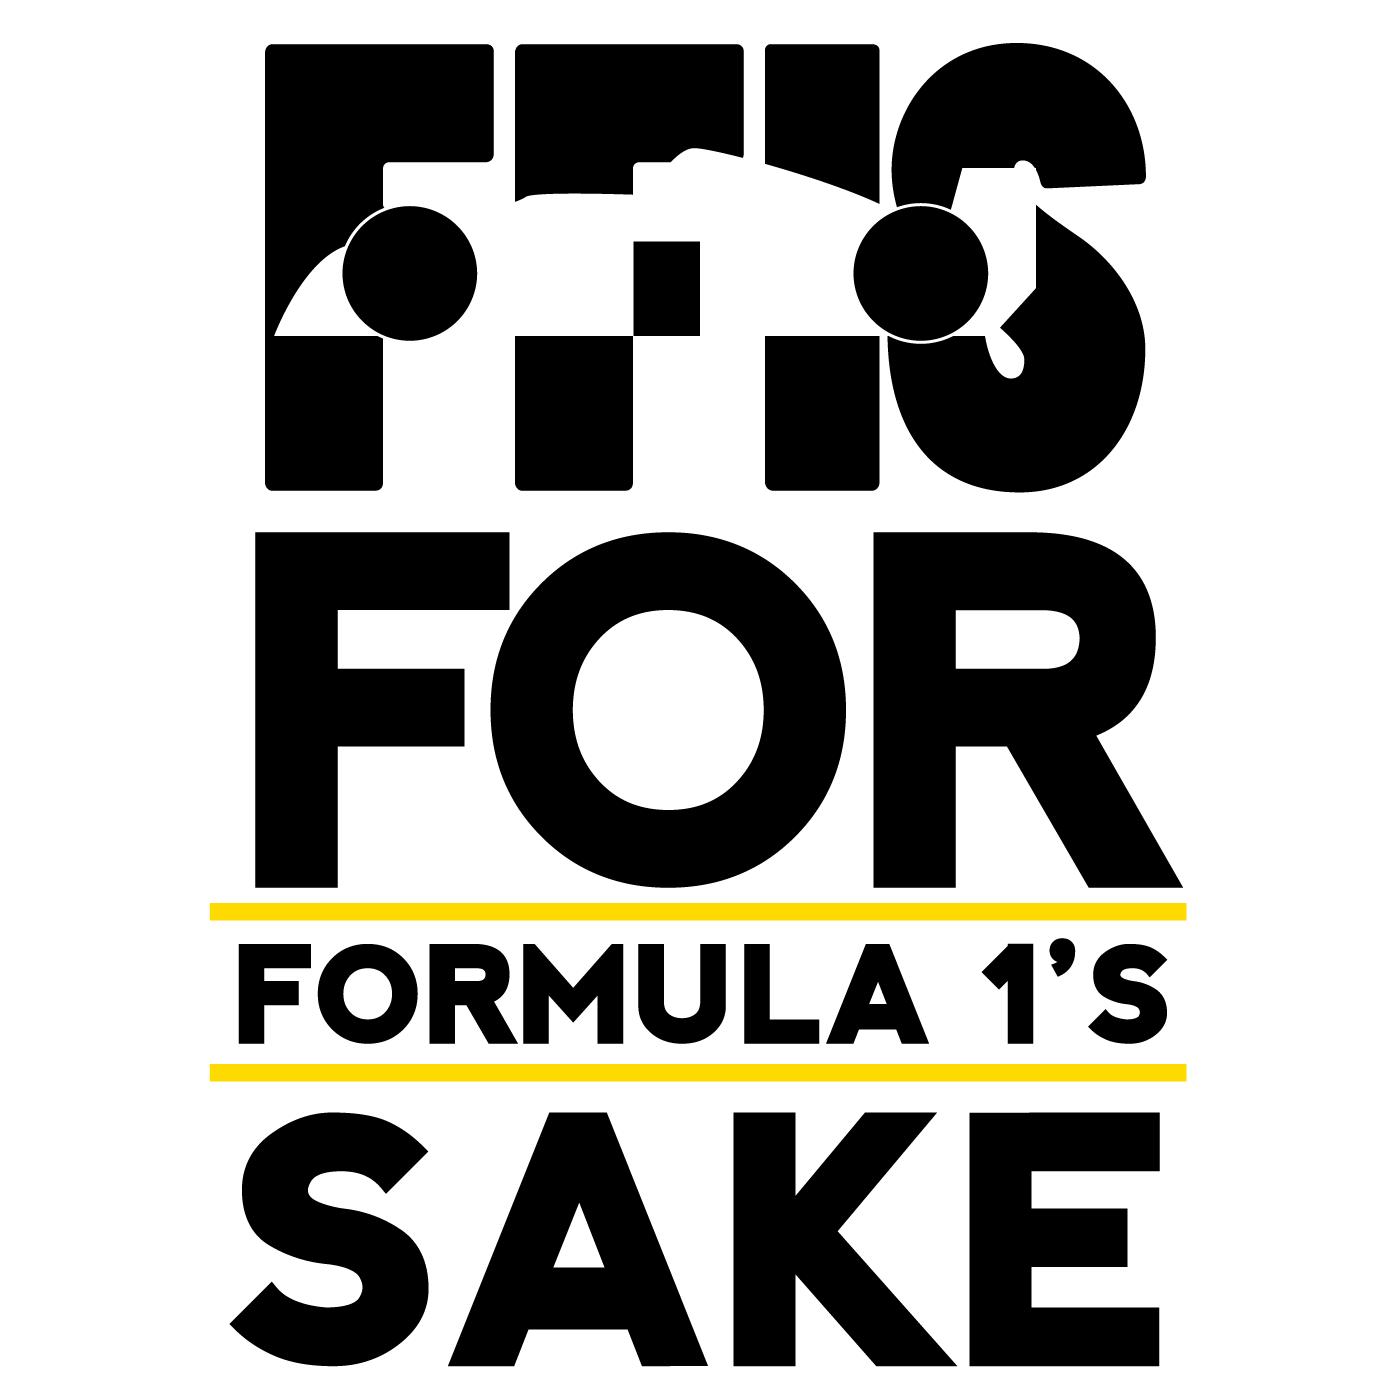 ff1s-1400px-logo.png